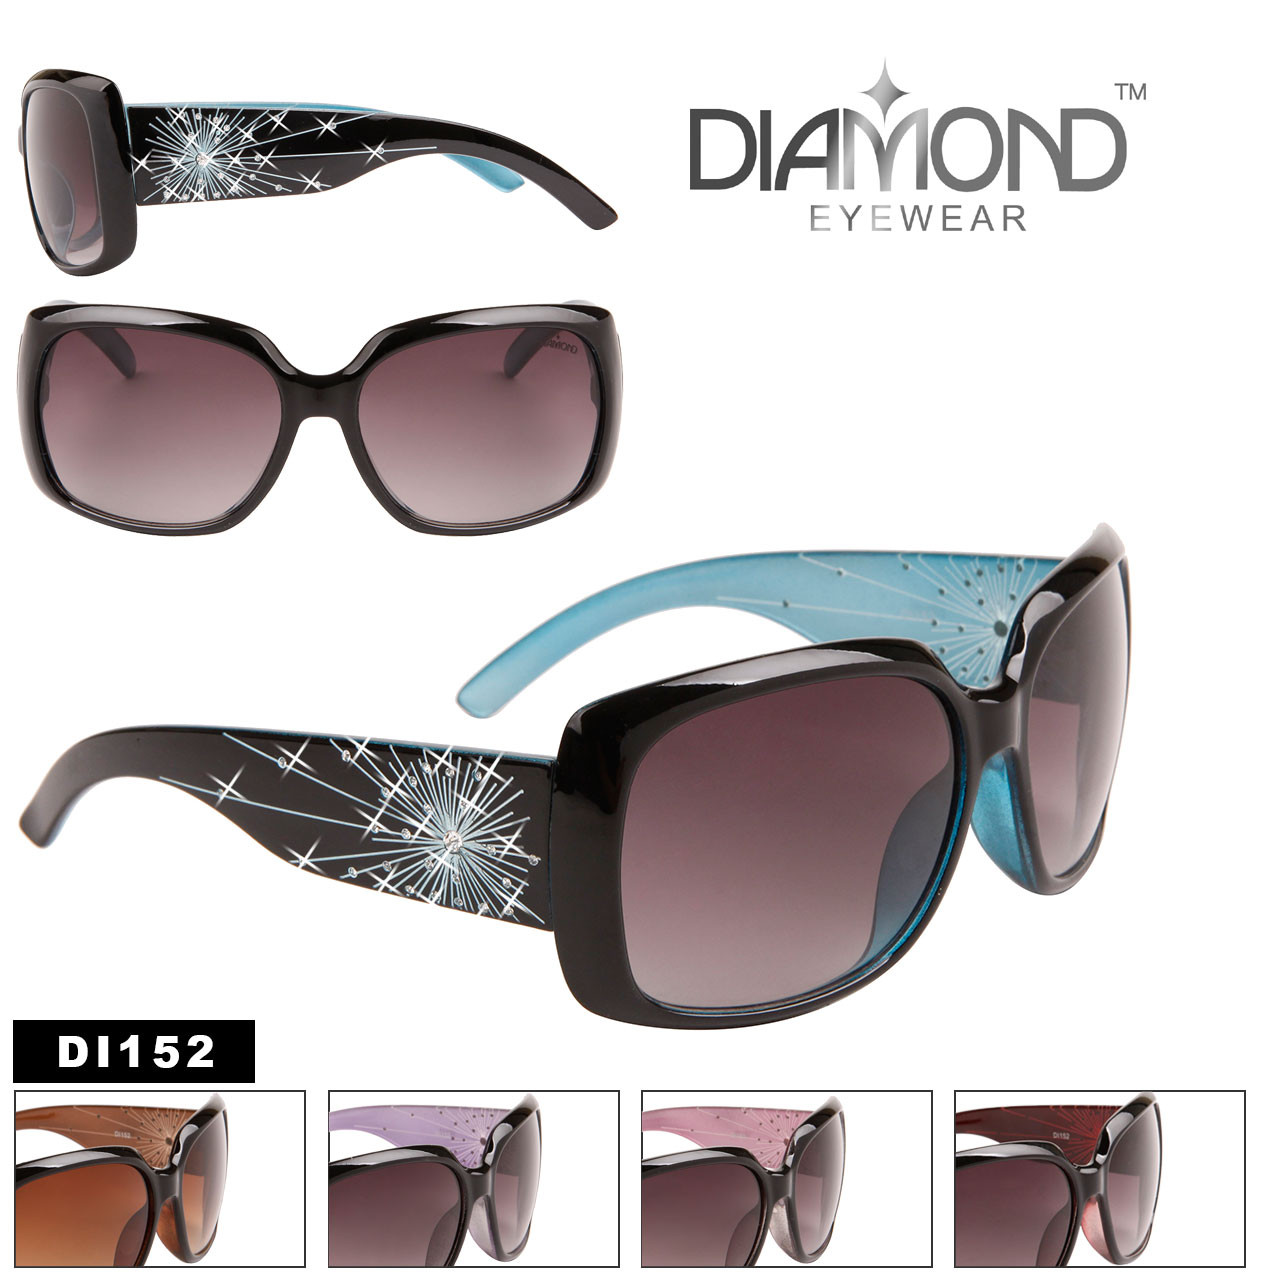 Designer Rhinestone Sunglasses in Bulk - Style #DI152